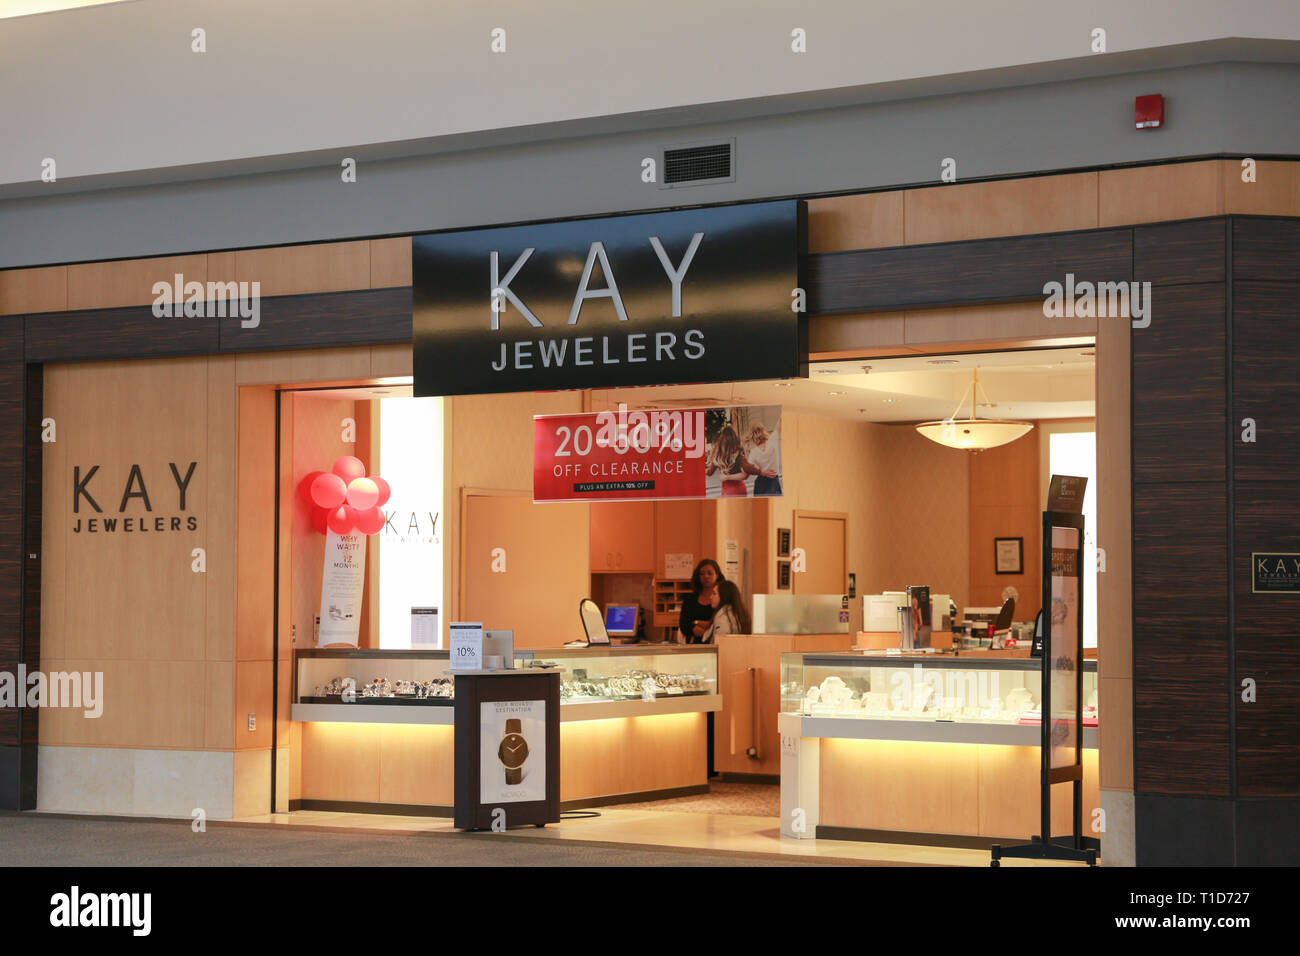 2fada690f Lawrence Township New Jersey, February 24, 2019:Kay Jewelers Retail at  Quaker Bridge